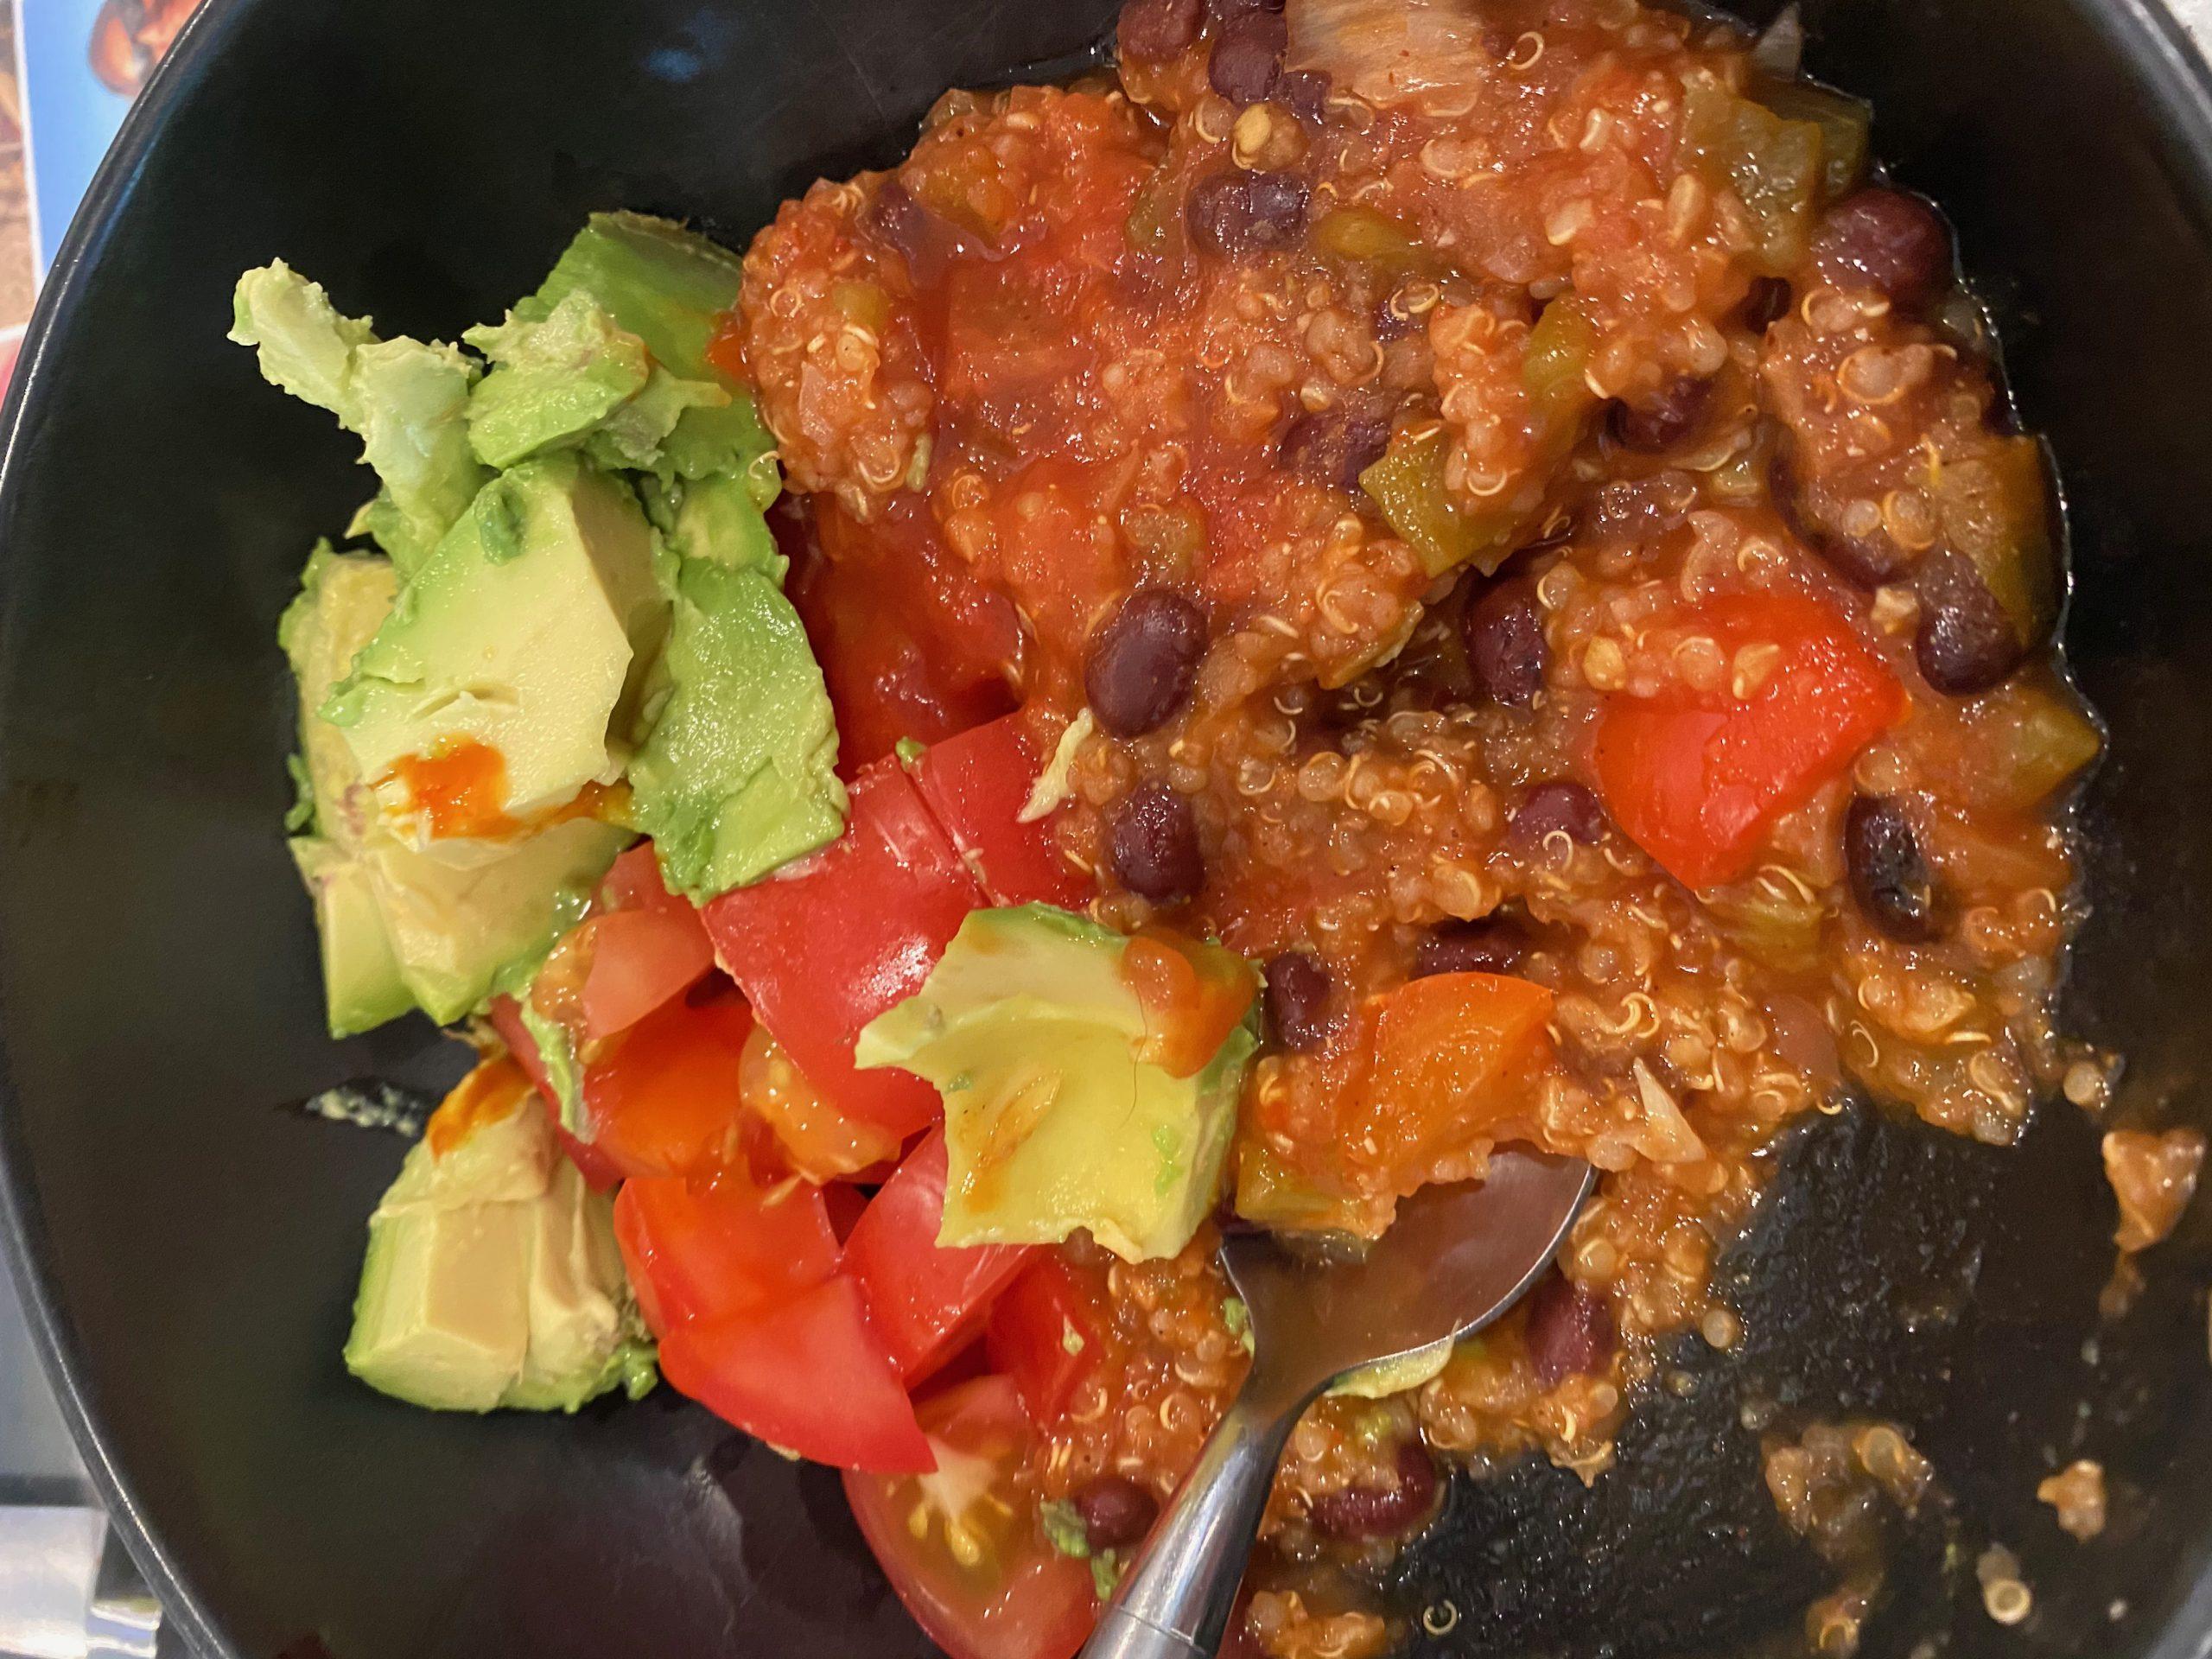 Quinoa Casserole – Slow cooker